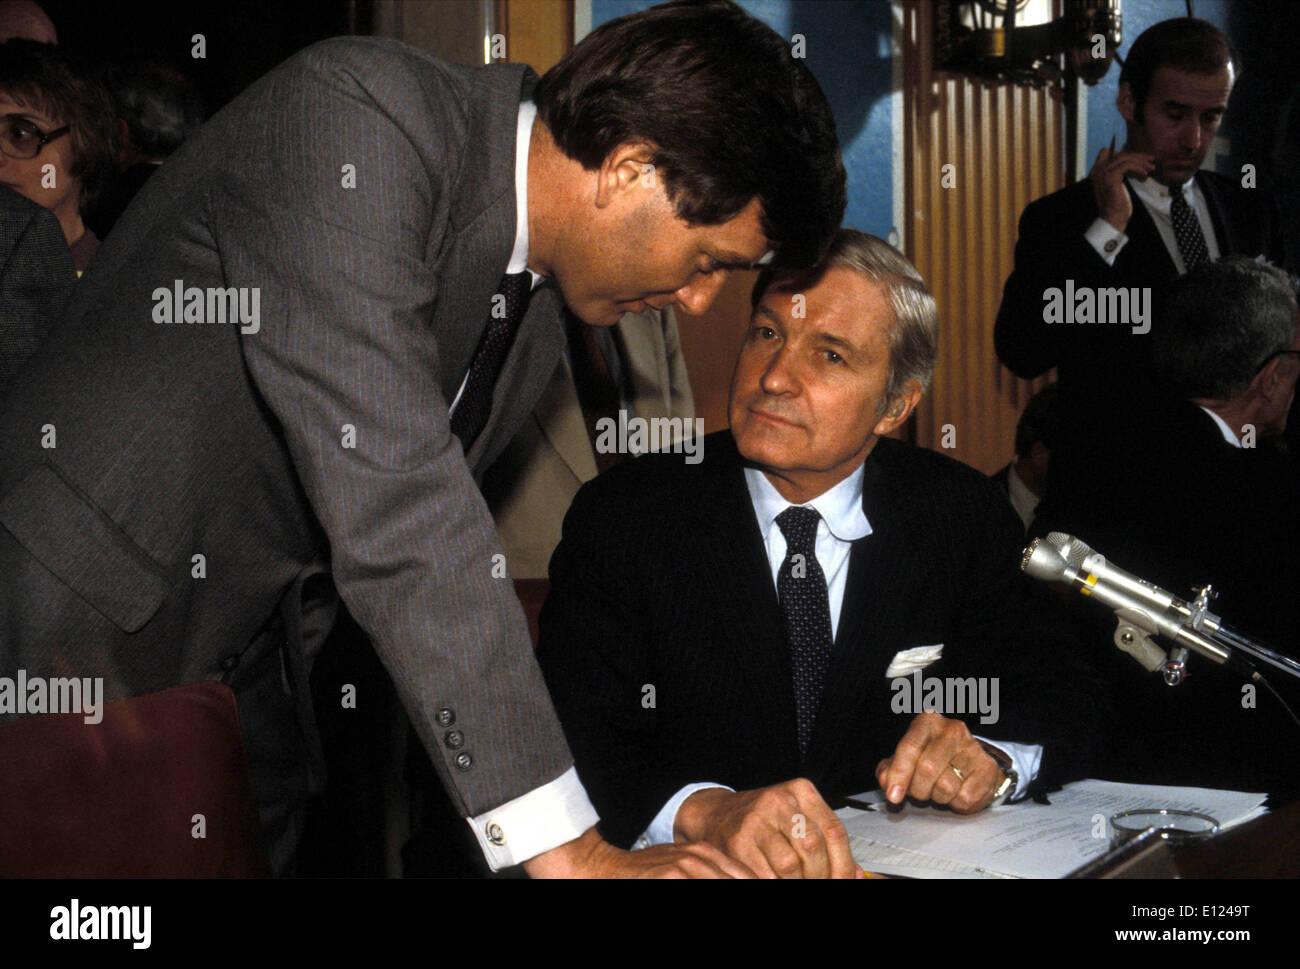 Aug 05, 1985; Washington, DC, Stati Uniti d'America; file (foto) (DATA SCONOSCIUTA) Stati Uniti Segretario di Stato James Baker.. : KE Immagini Stock